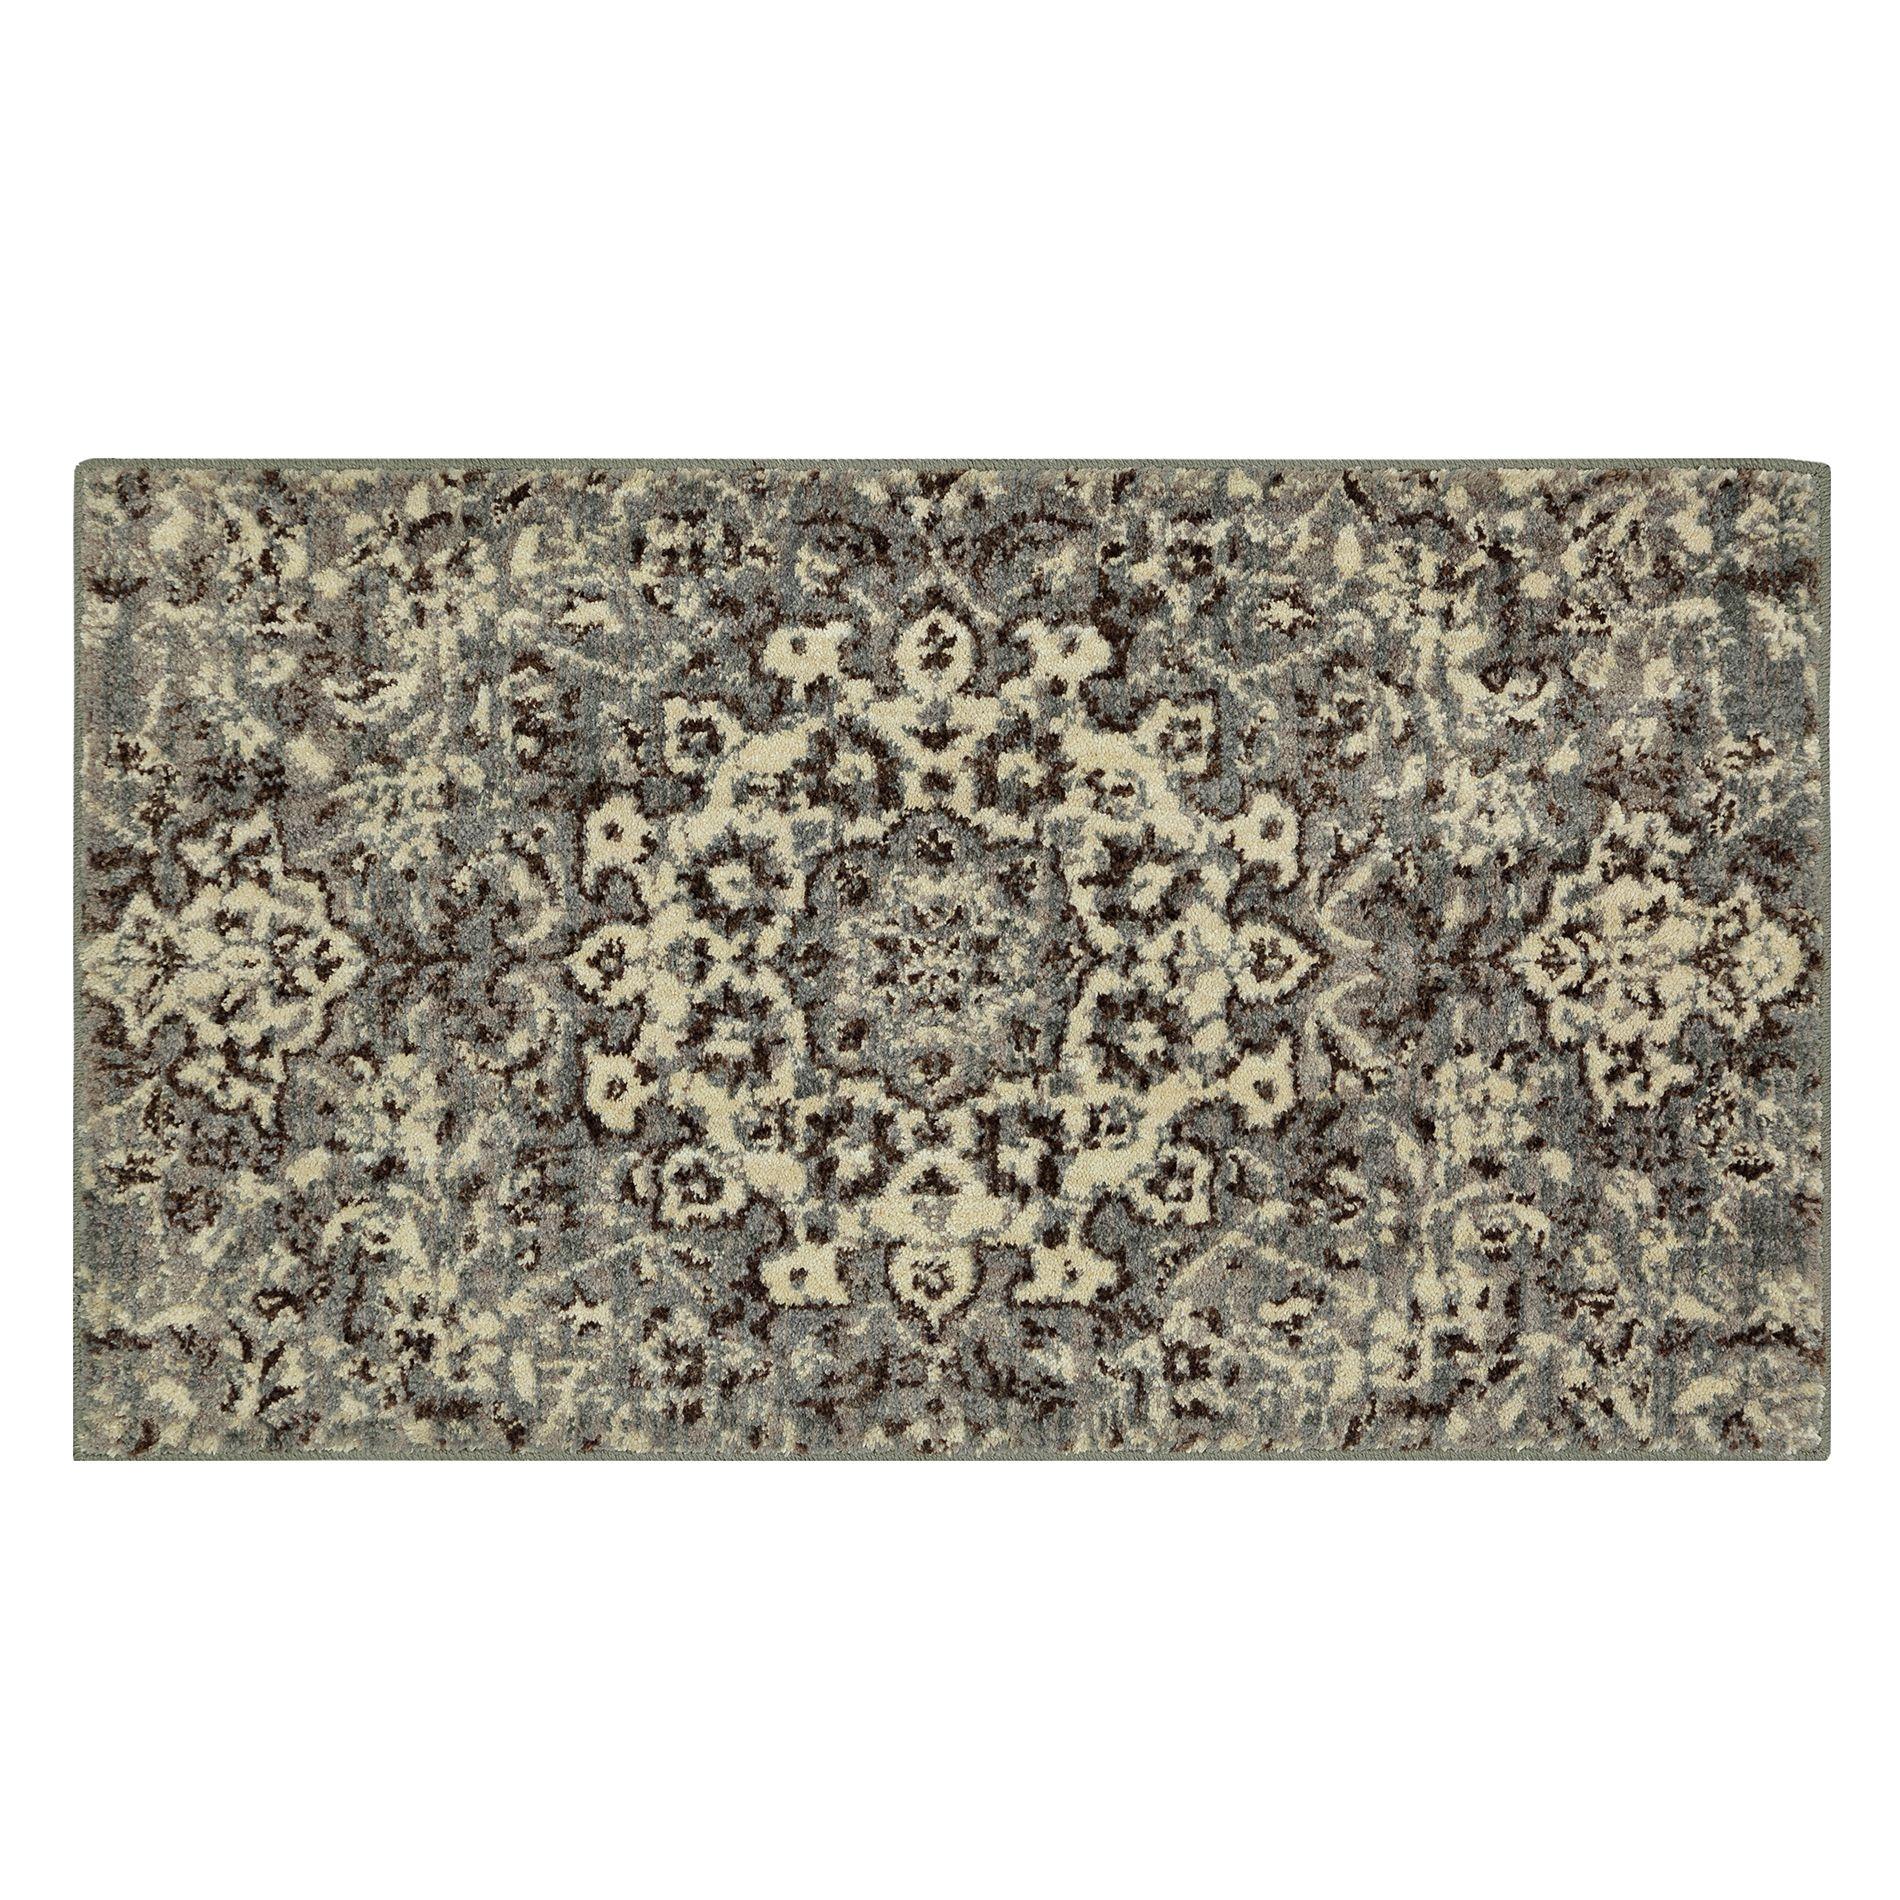 Mohawk grey medallion stone area rug